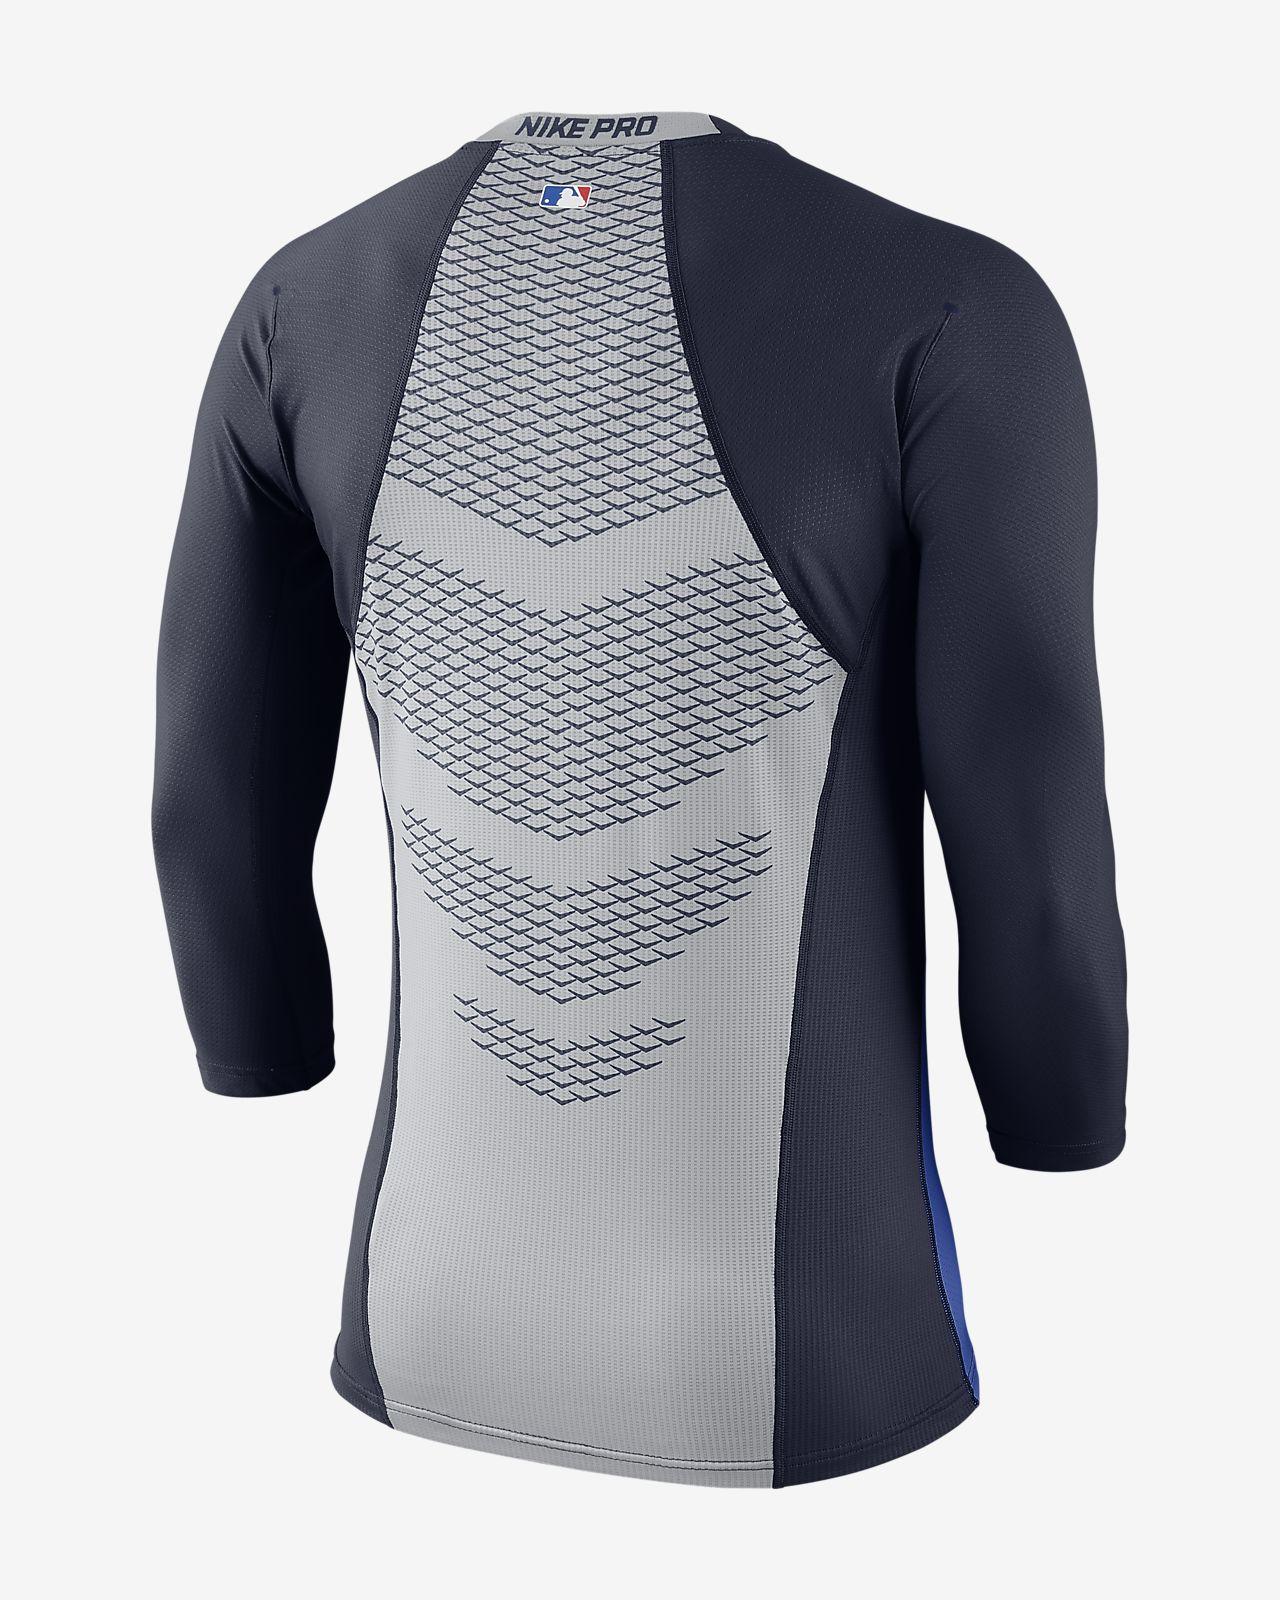 Nike Pro HyperCool (MLB Red Sox) Men's 3/4 Sleeve Top